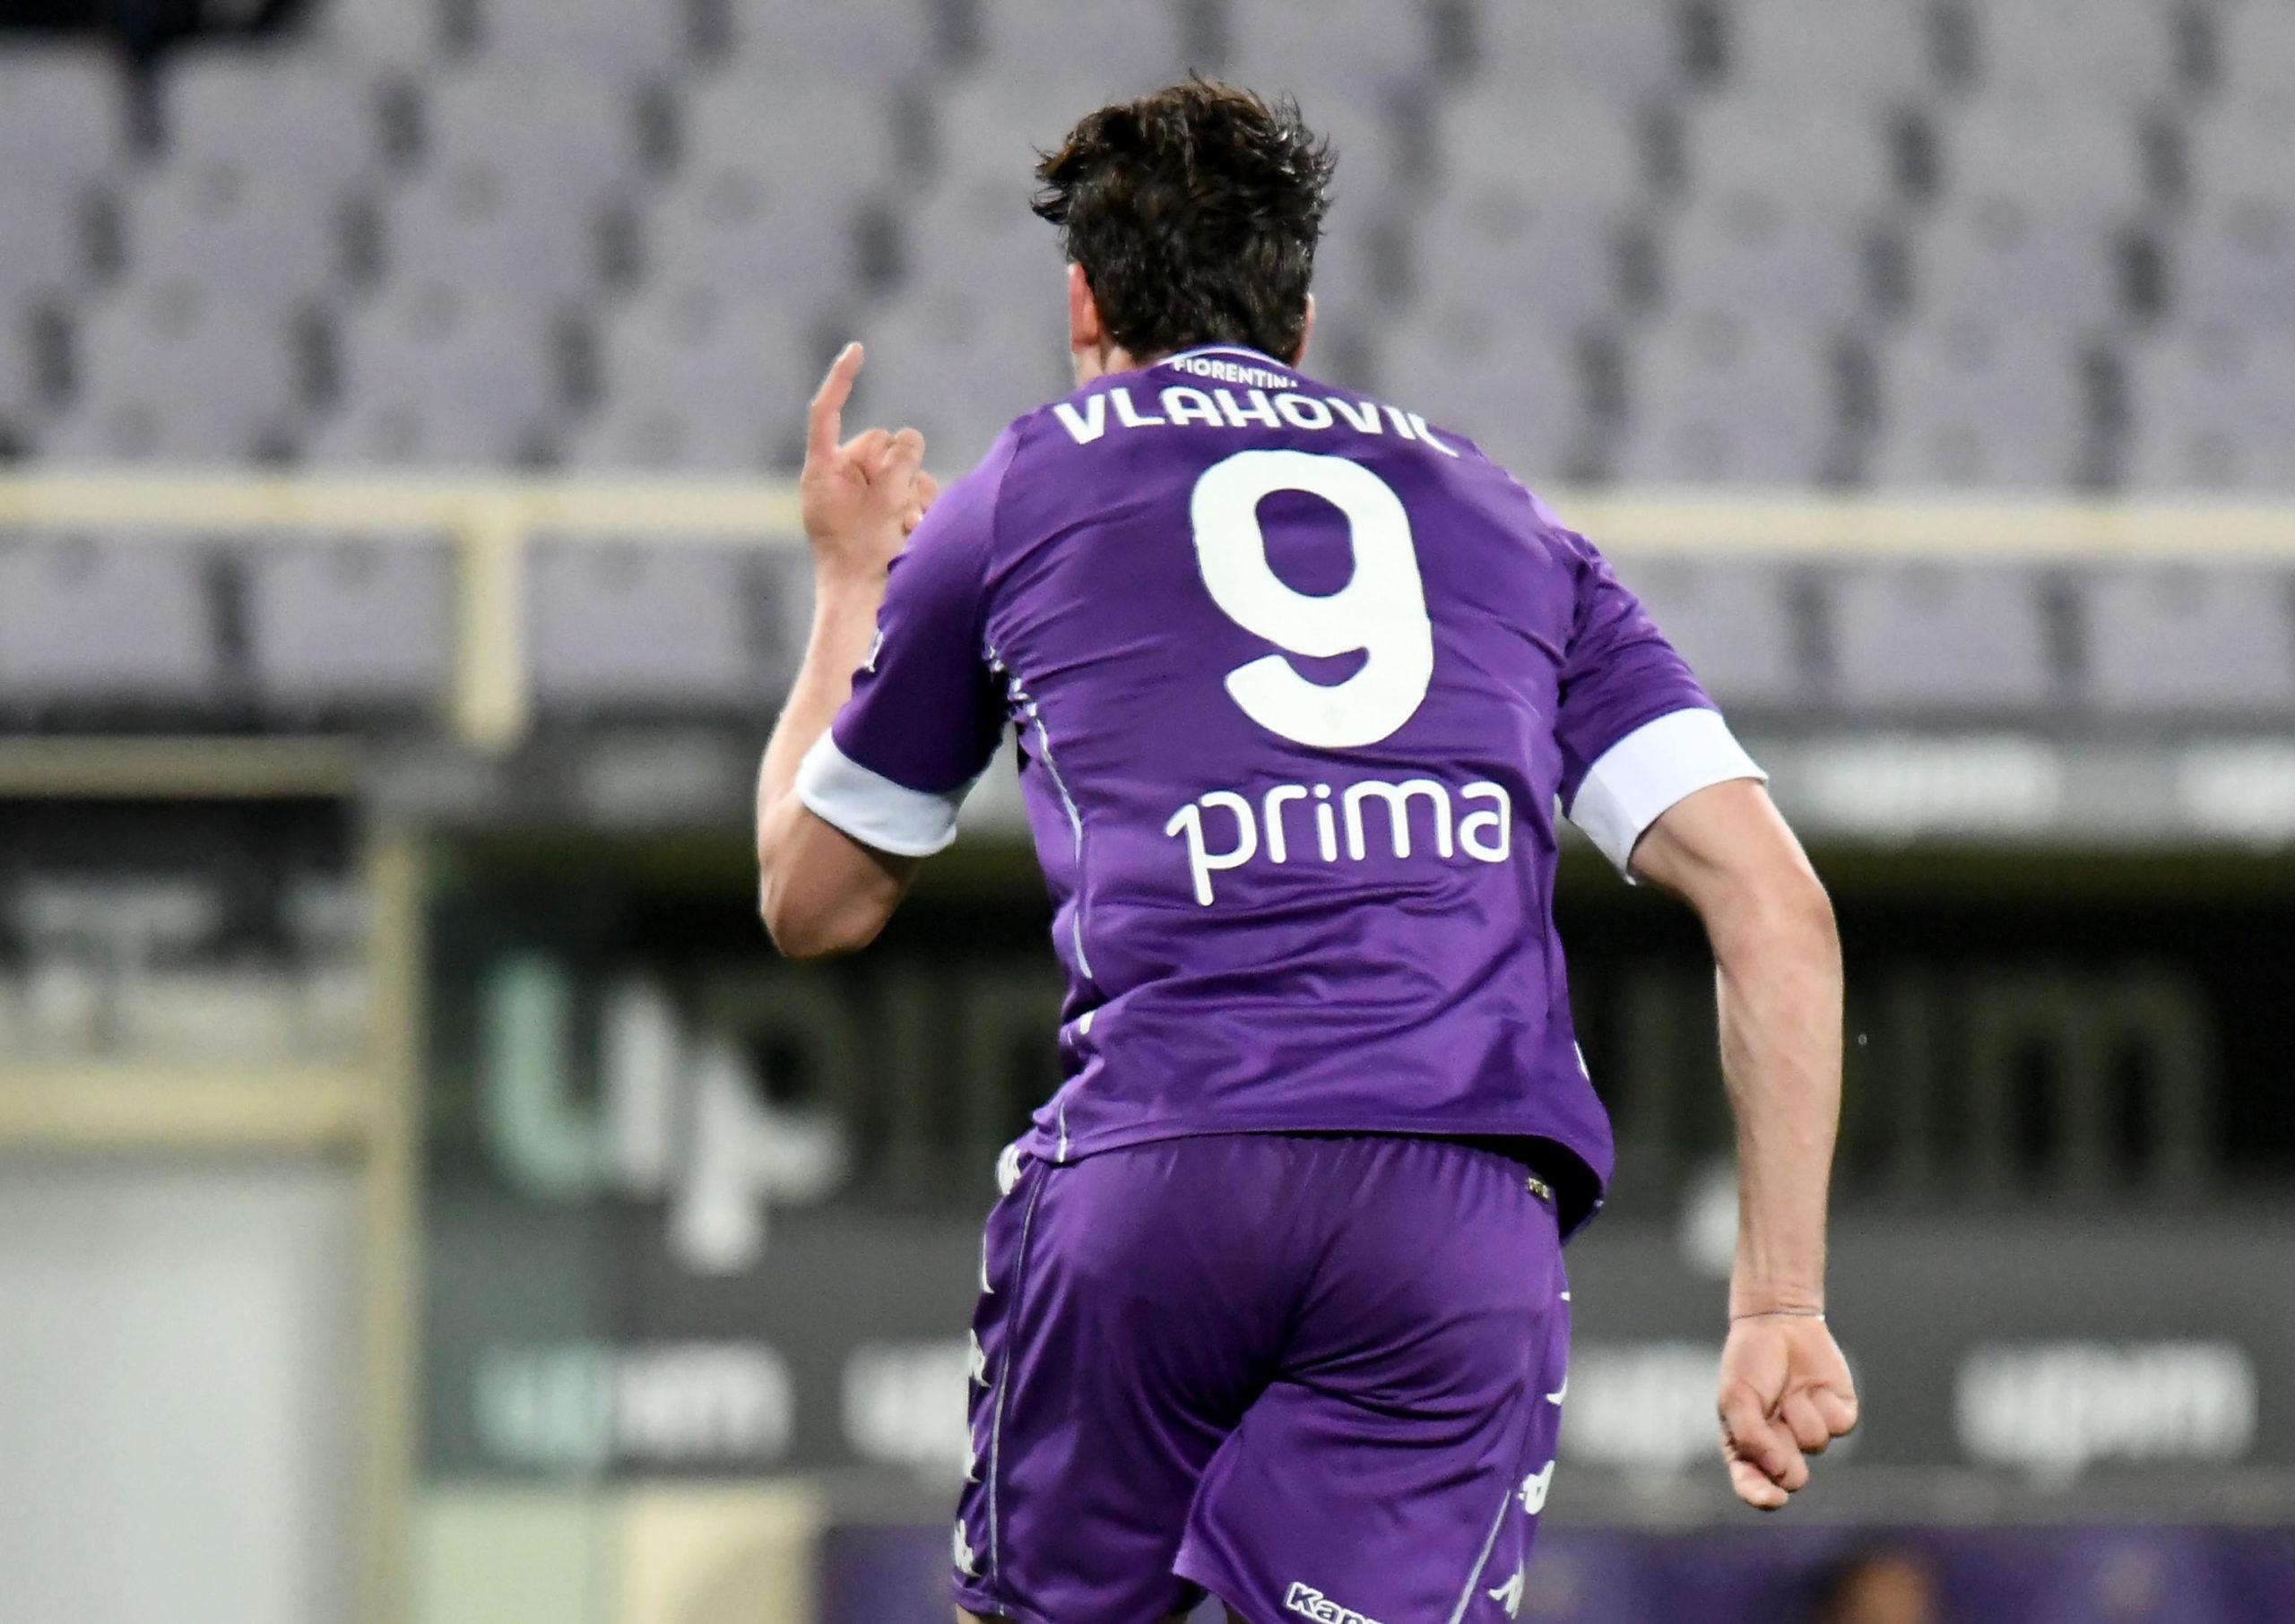 Fiorentina's Dusan Vlahovic celebrates